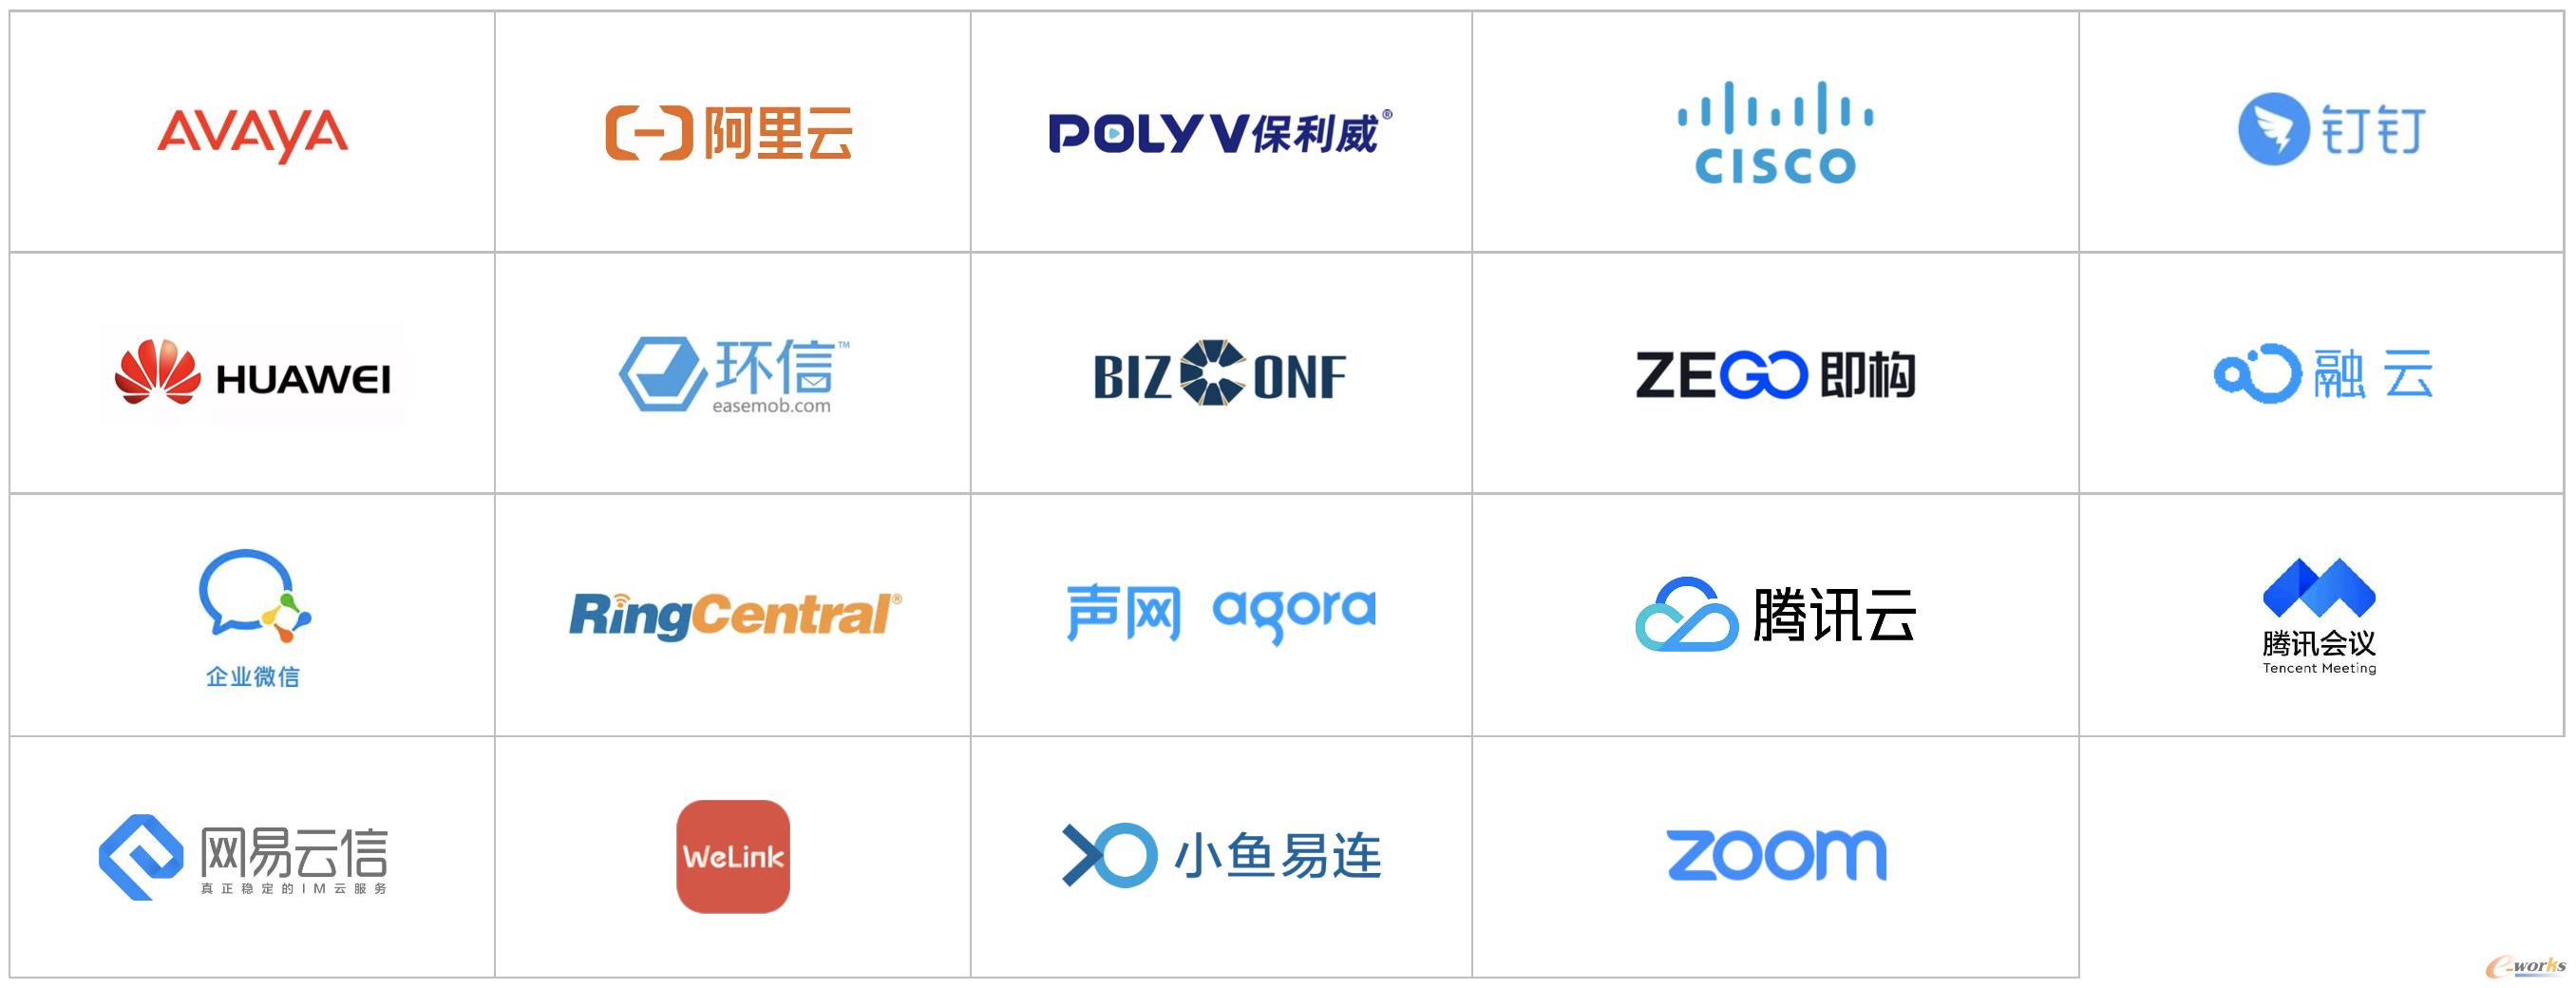 http://www.e-works.net.cn/News/articleimage/202012/132512888432981600_new.png